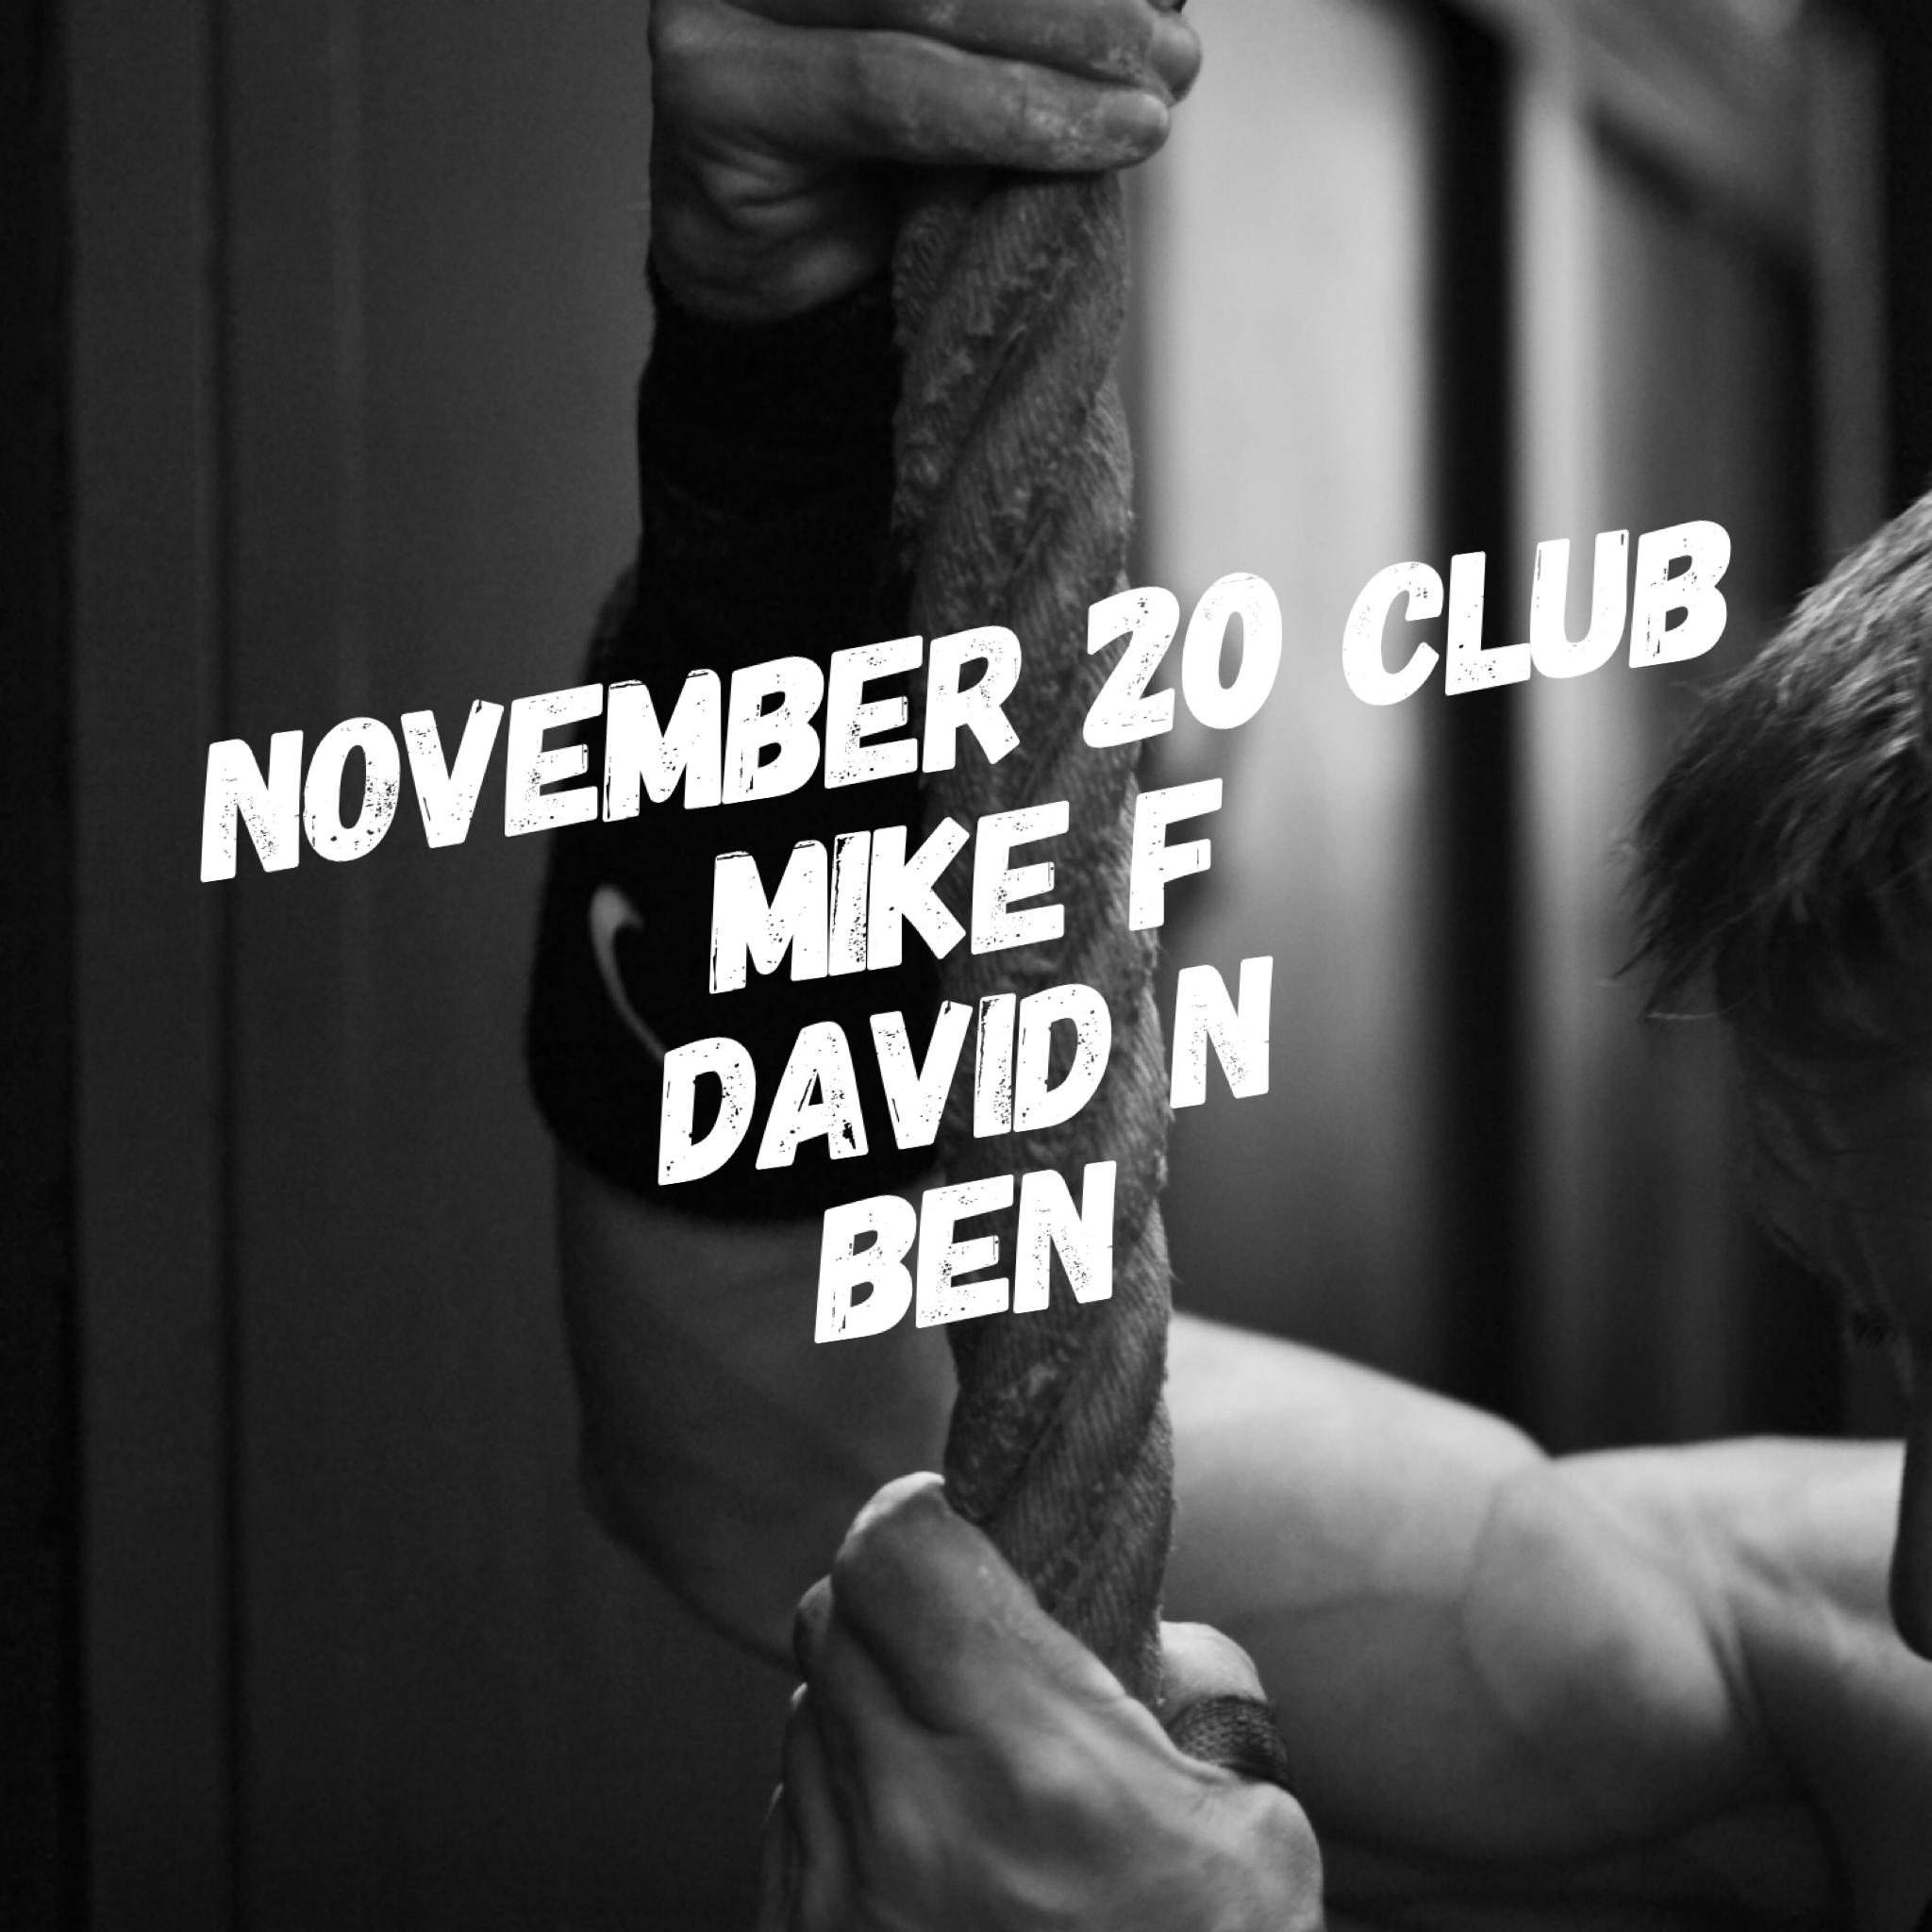 November 20 Club